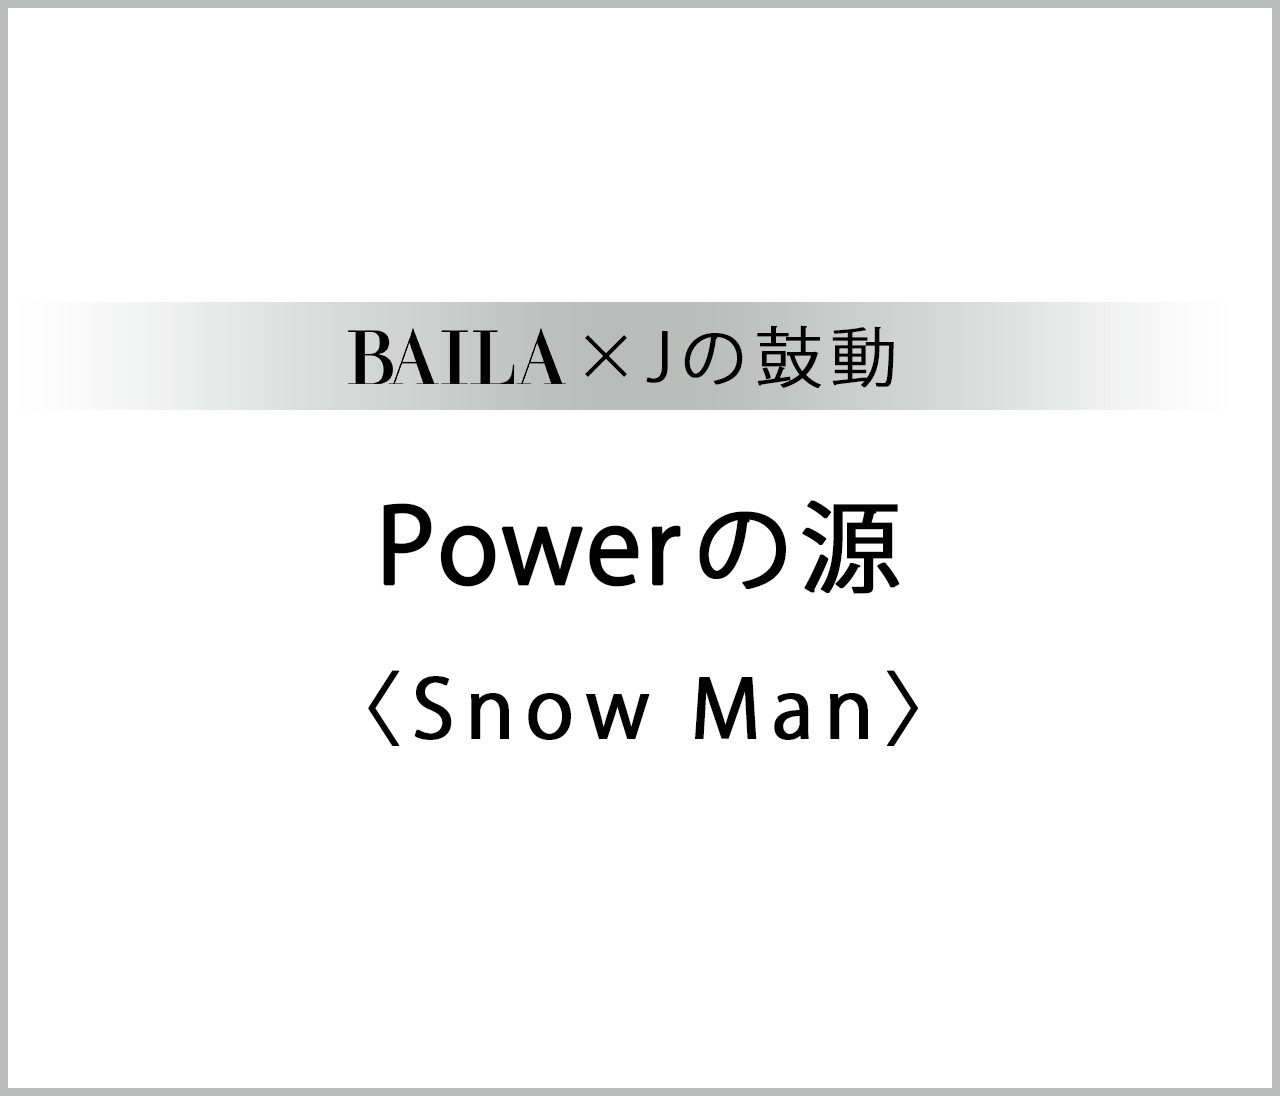 【 #SnowMan 】Snow Manスペシャルインタビューまとめ【BAILA × Jの鼓動】